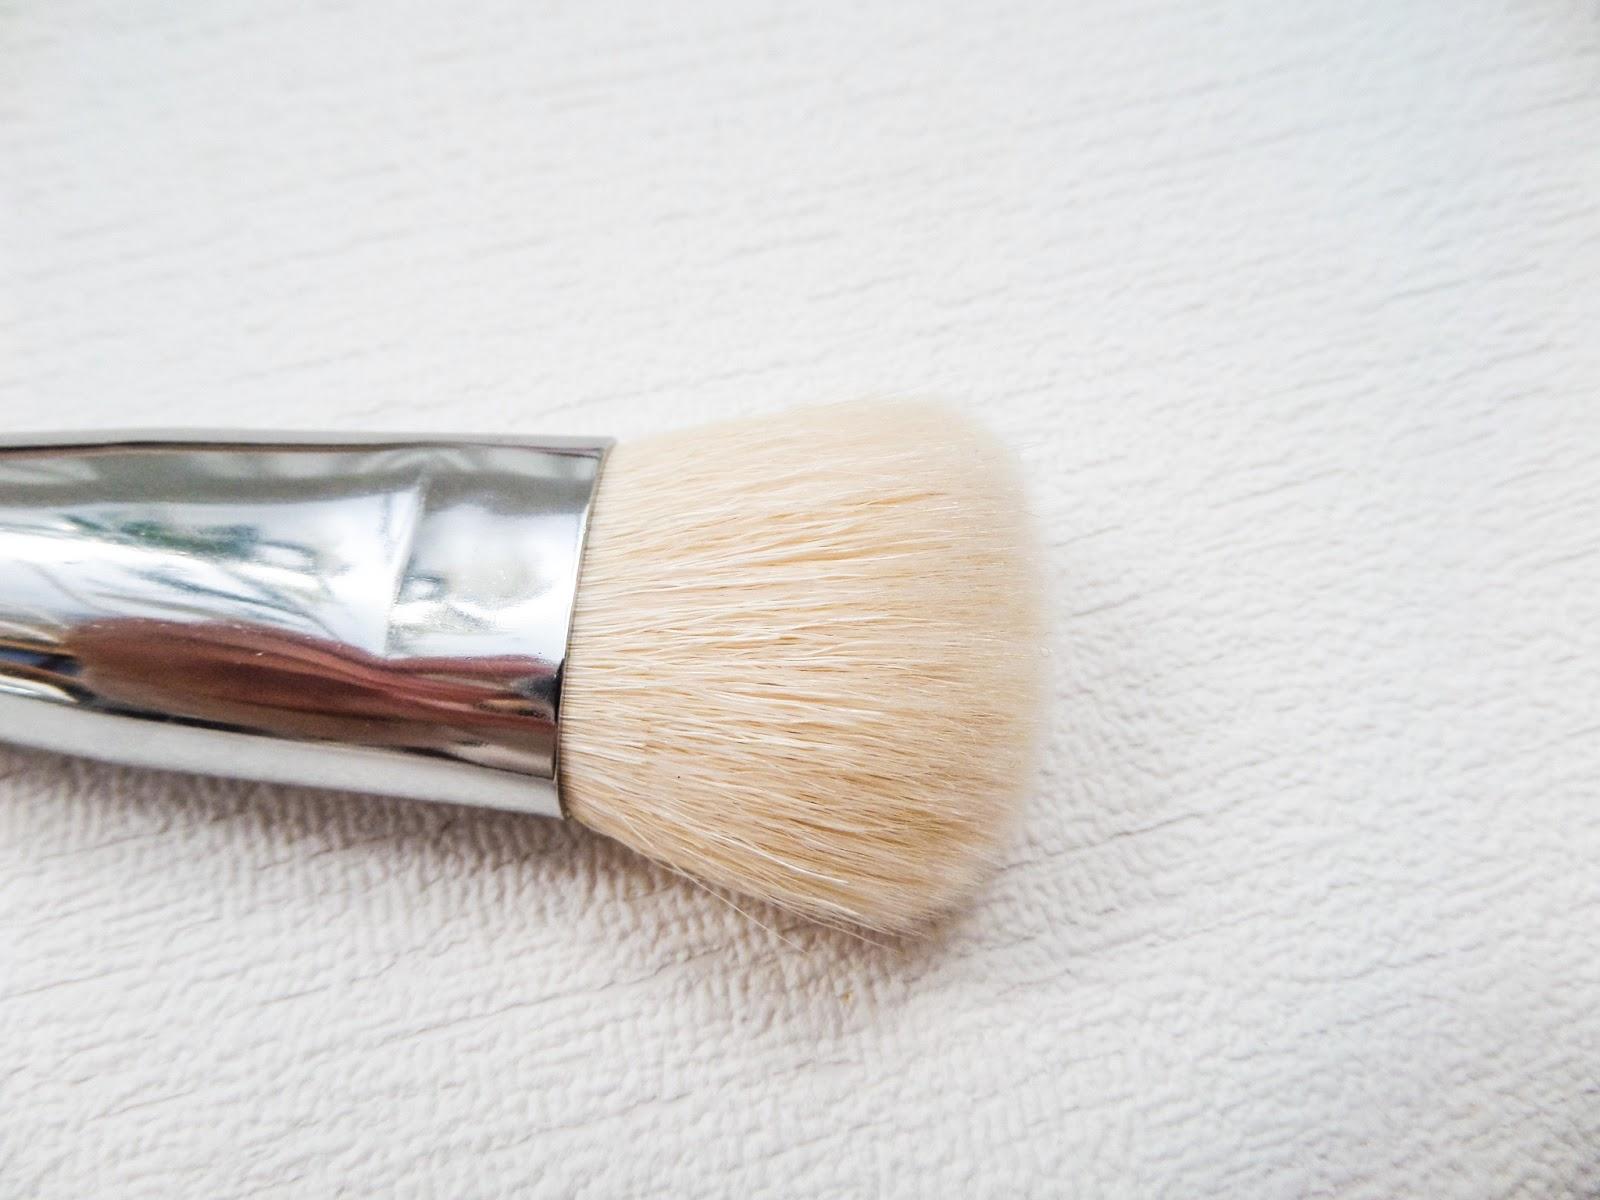 Pro Chisel Blush (C472) Crownbrush